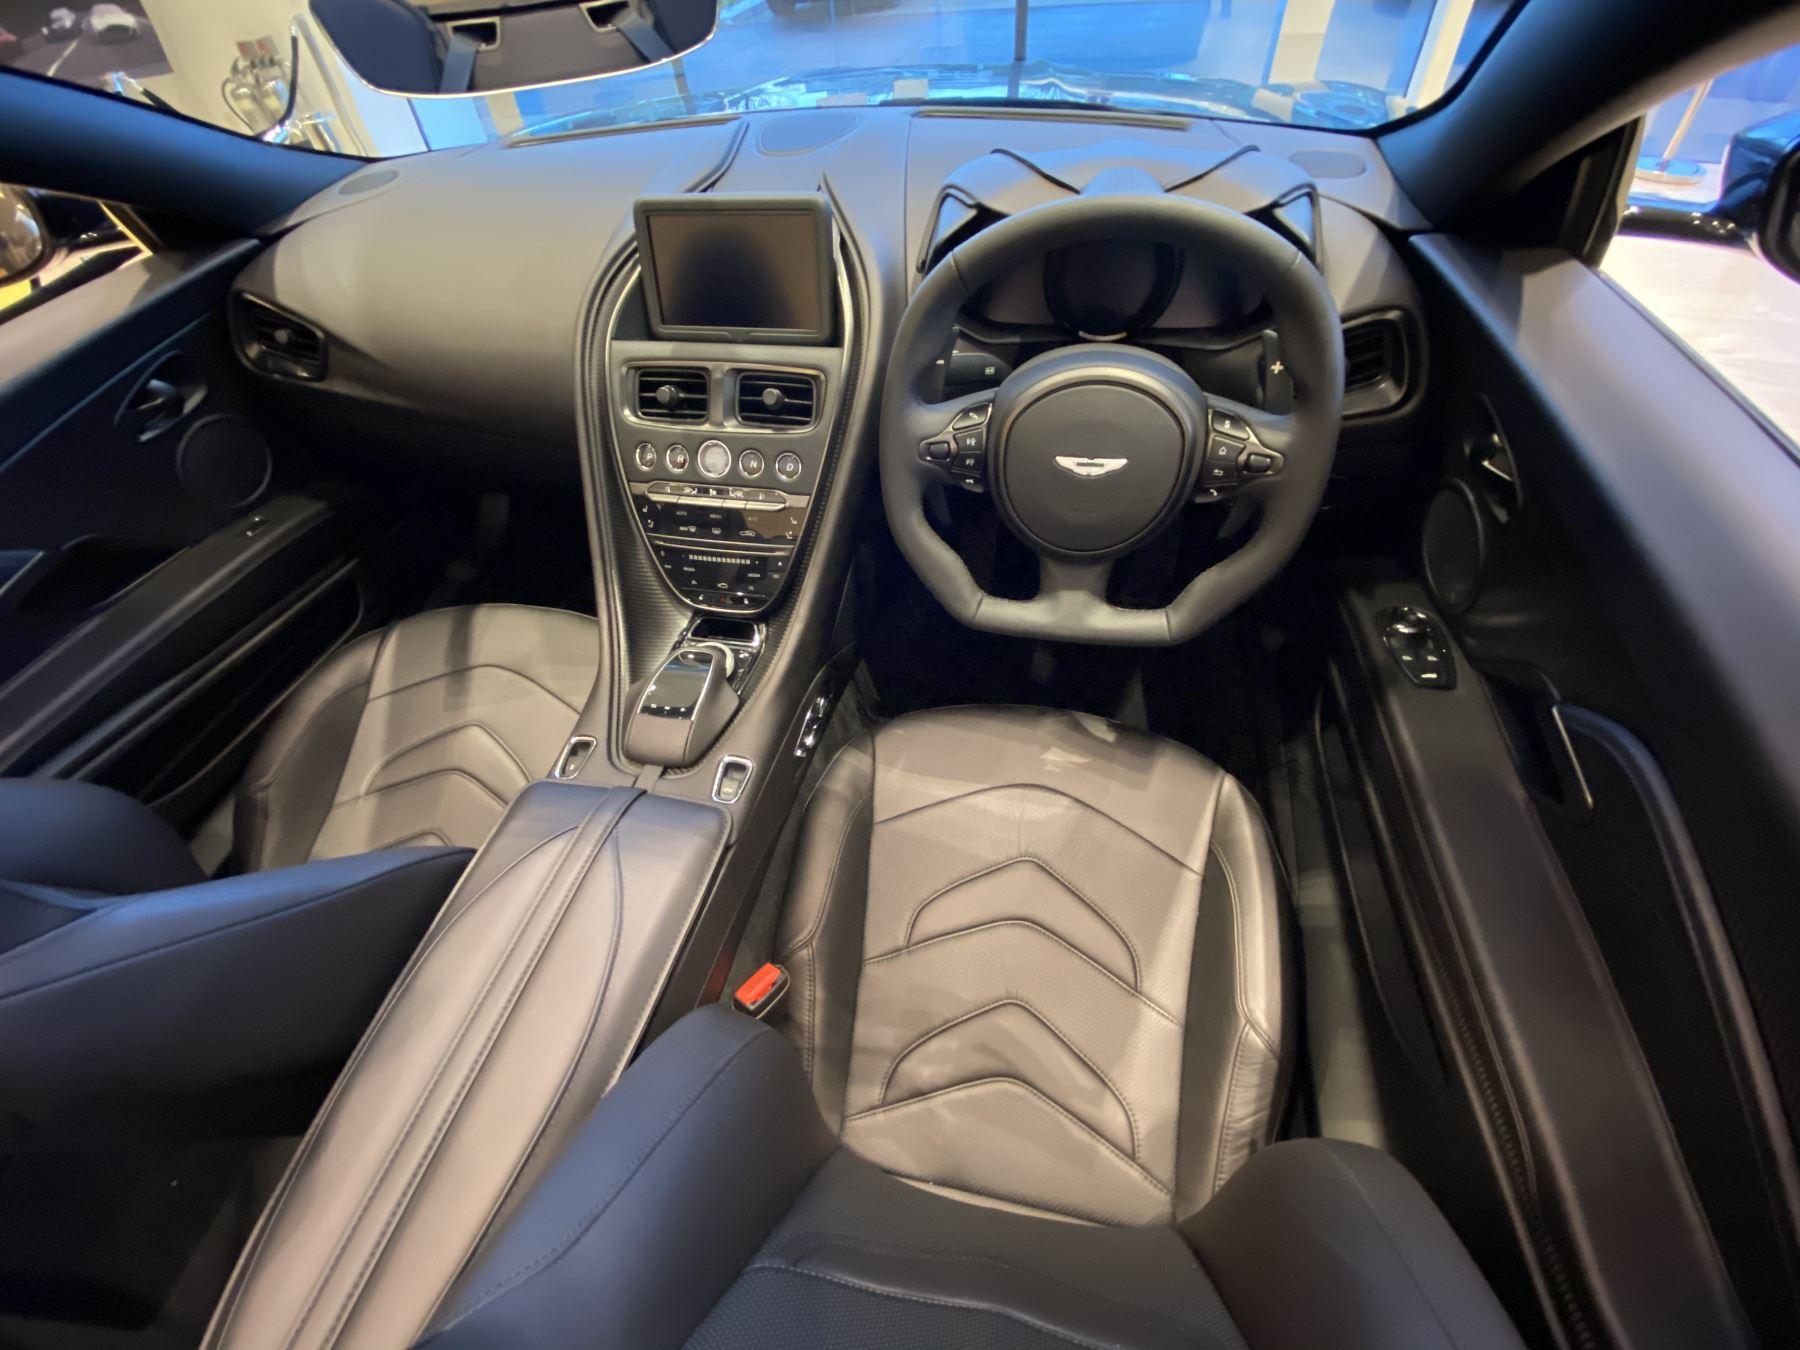 Aston Martin DBS V12 Superleggera Volante Touchtronic image 19